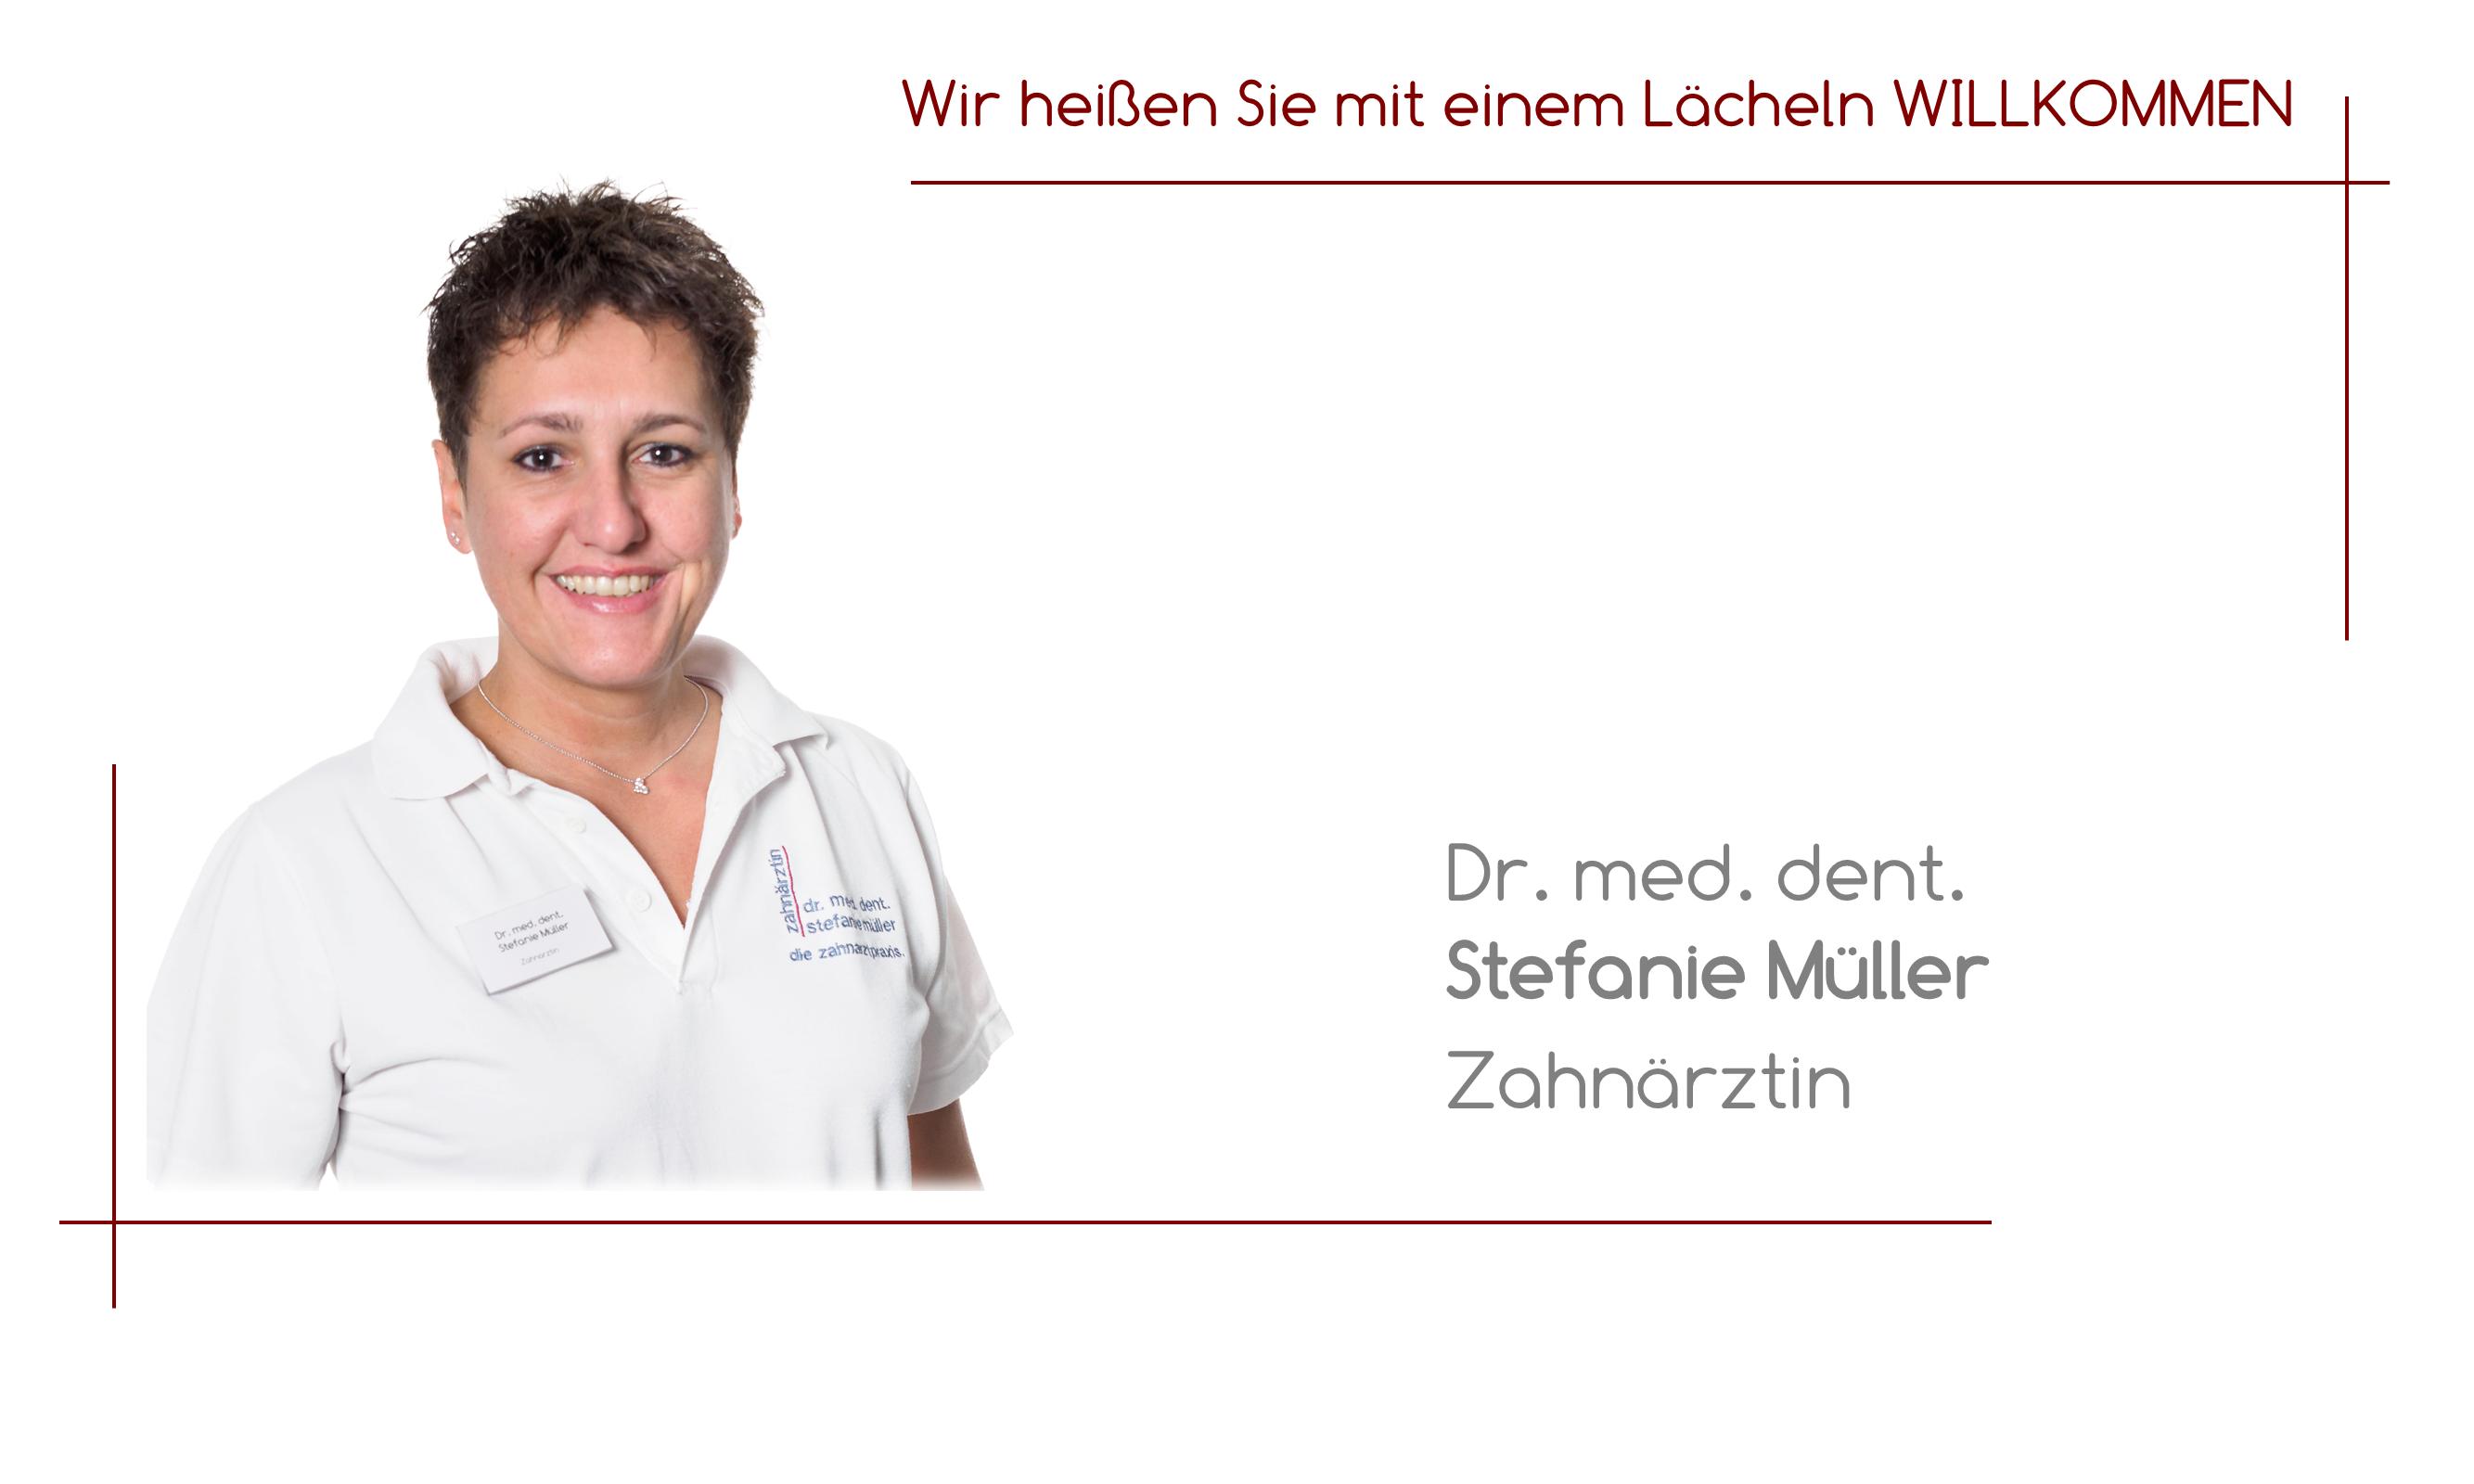 Dr. med. dent. Stefanie Müller - Zahnärztin